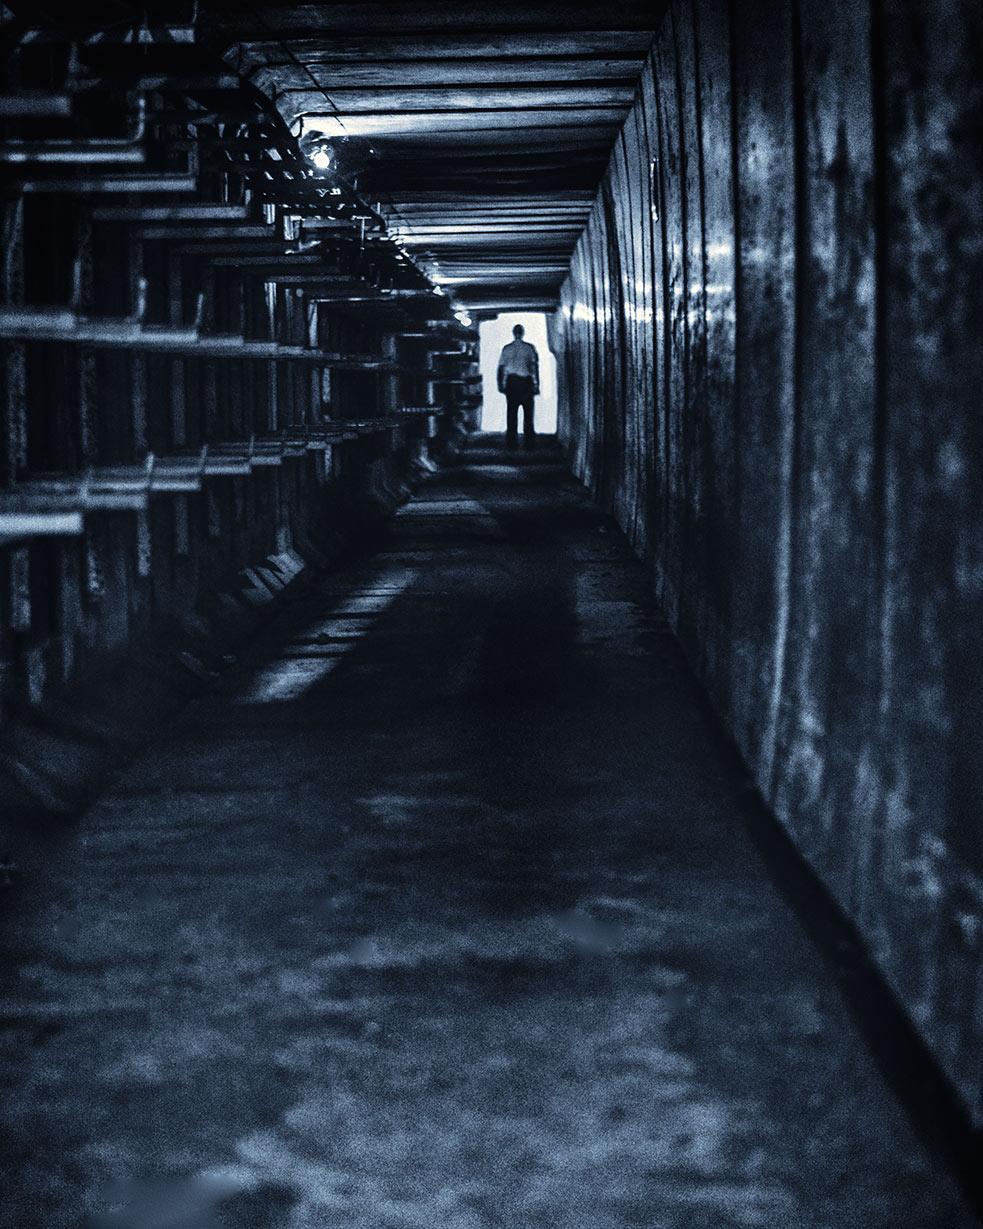 Светлина в края на тунела | Author ARIGO | PHOTO FORUM